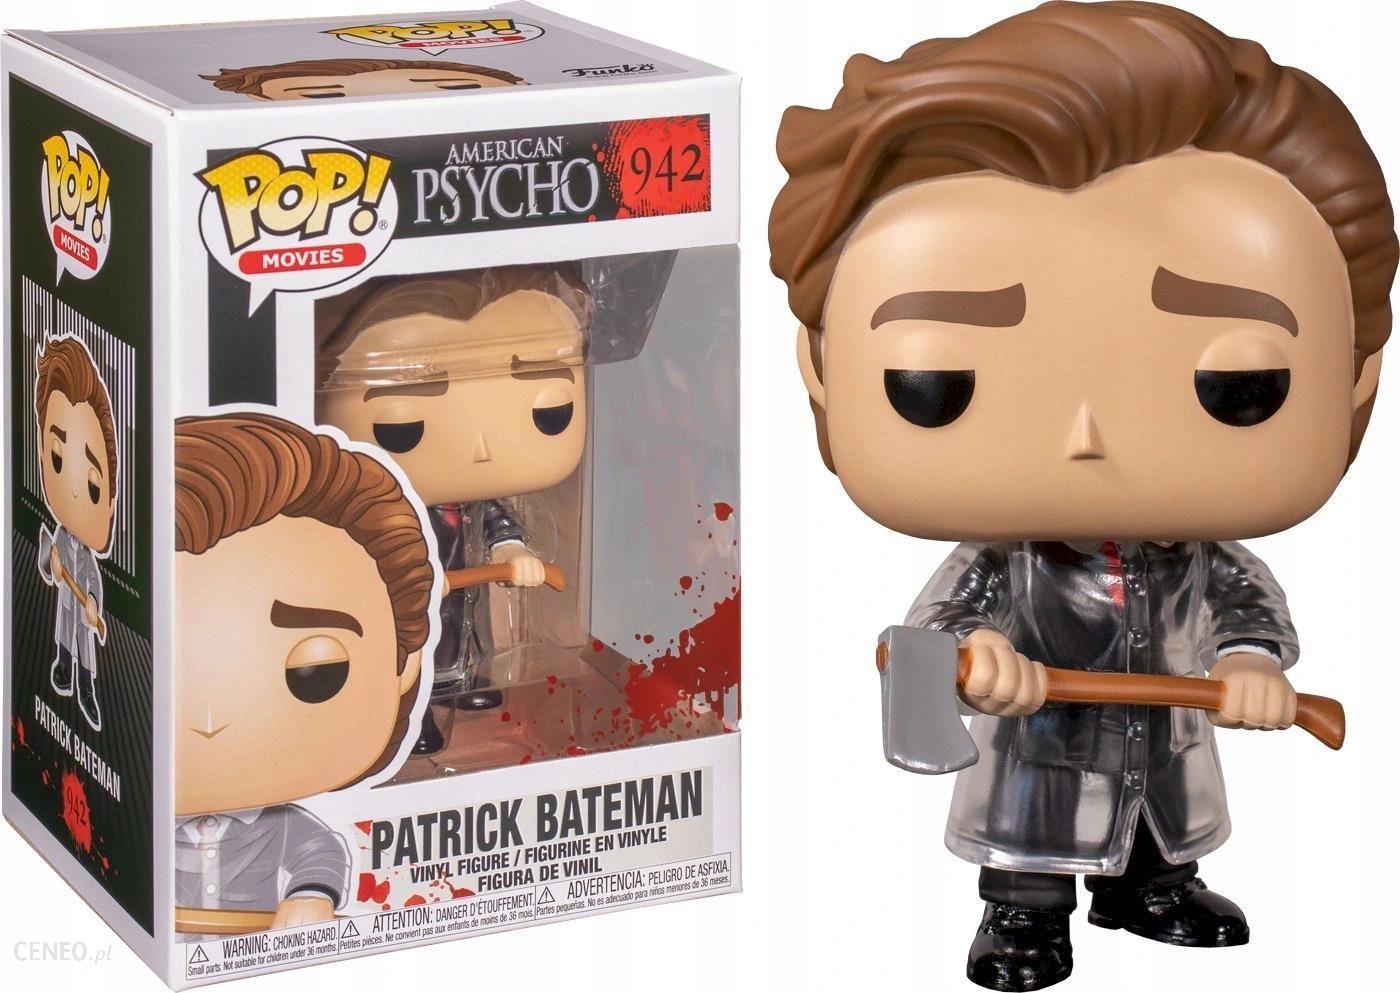 Funko Pop! American Psycho Patrick Bateman 942